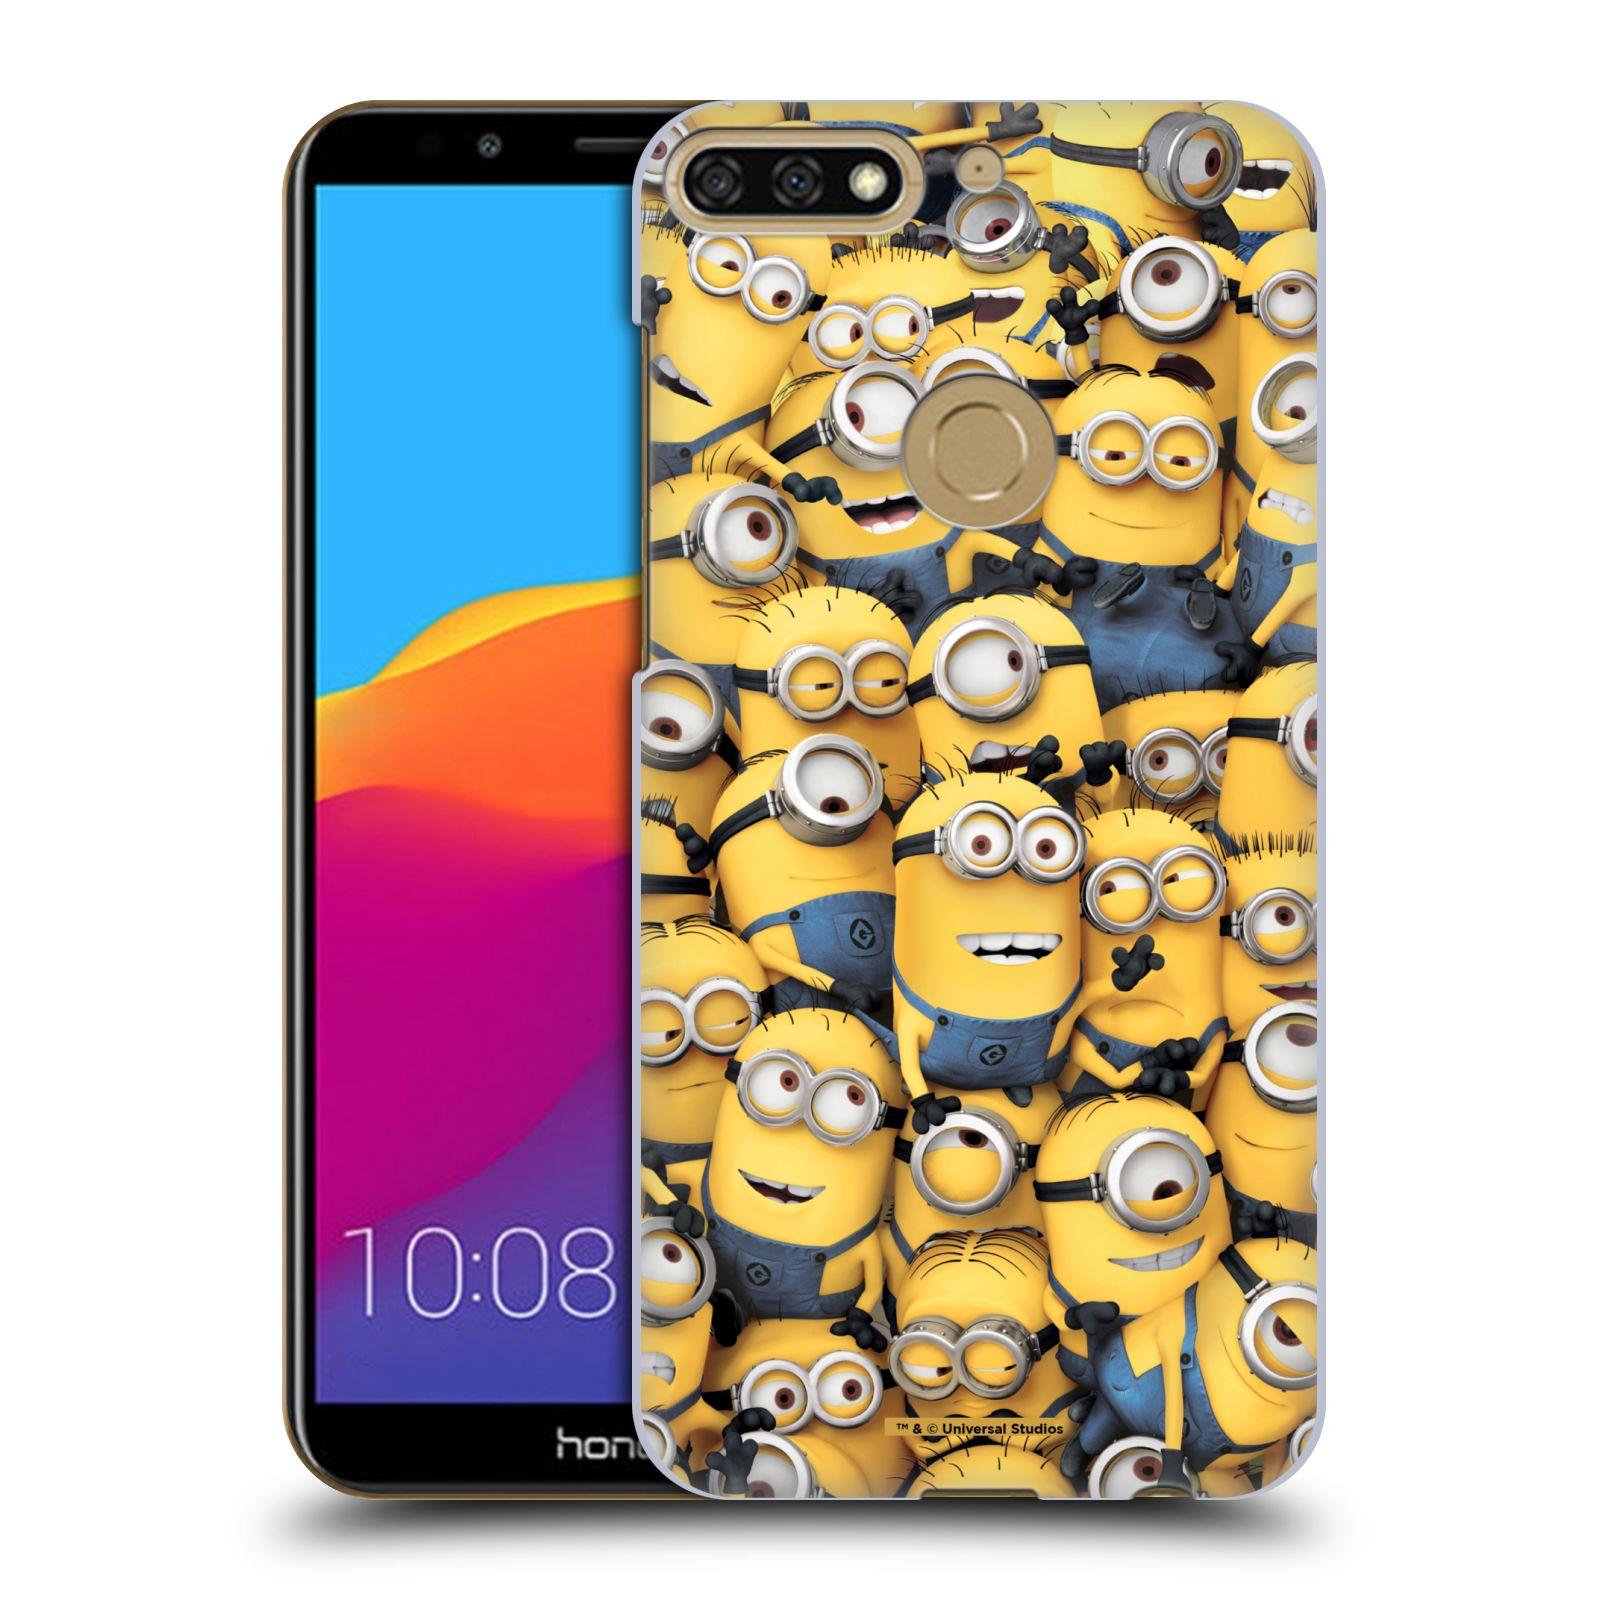 Plastové pouzdro na mobil Huawei Y7 Prime 2018 - Head Case - Mimoni všude z filmu Já, padouch - Despicable Me